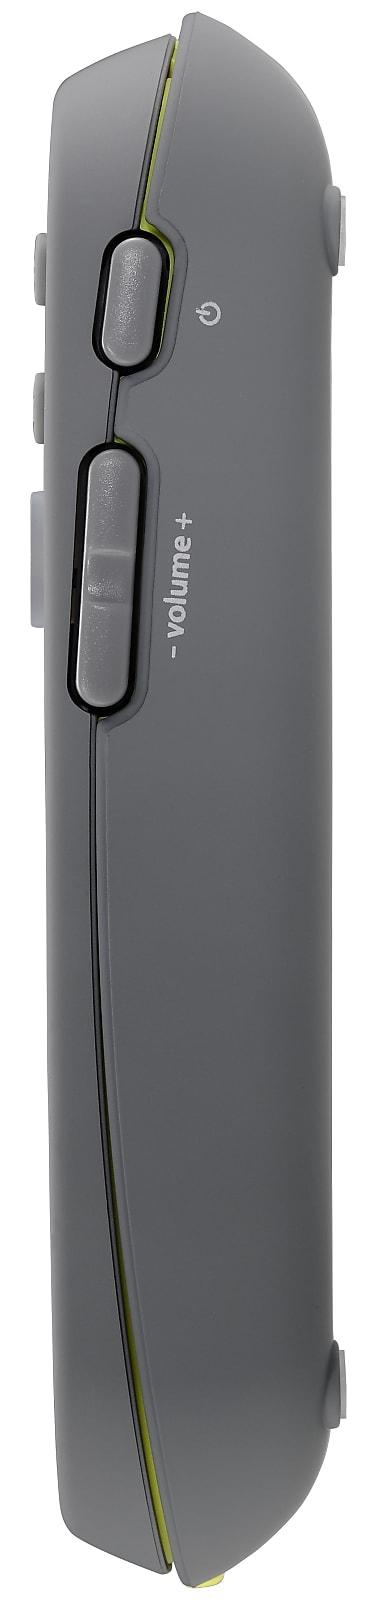 Korg Kaossilator 2S Handheld Dynamic Touchpad Phrase Synthesizer